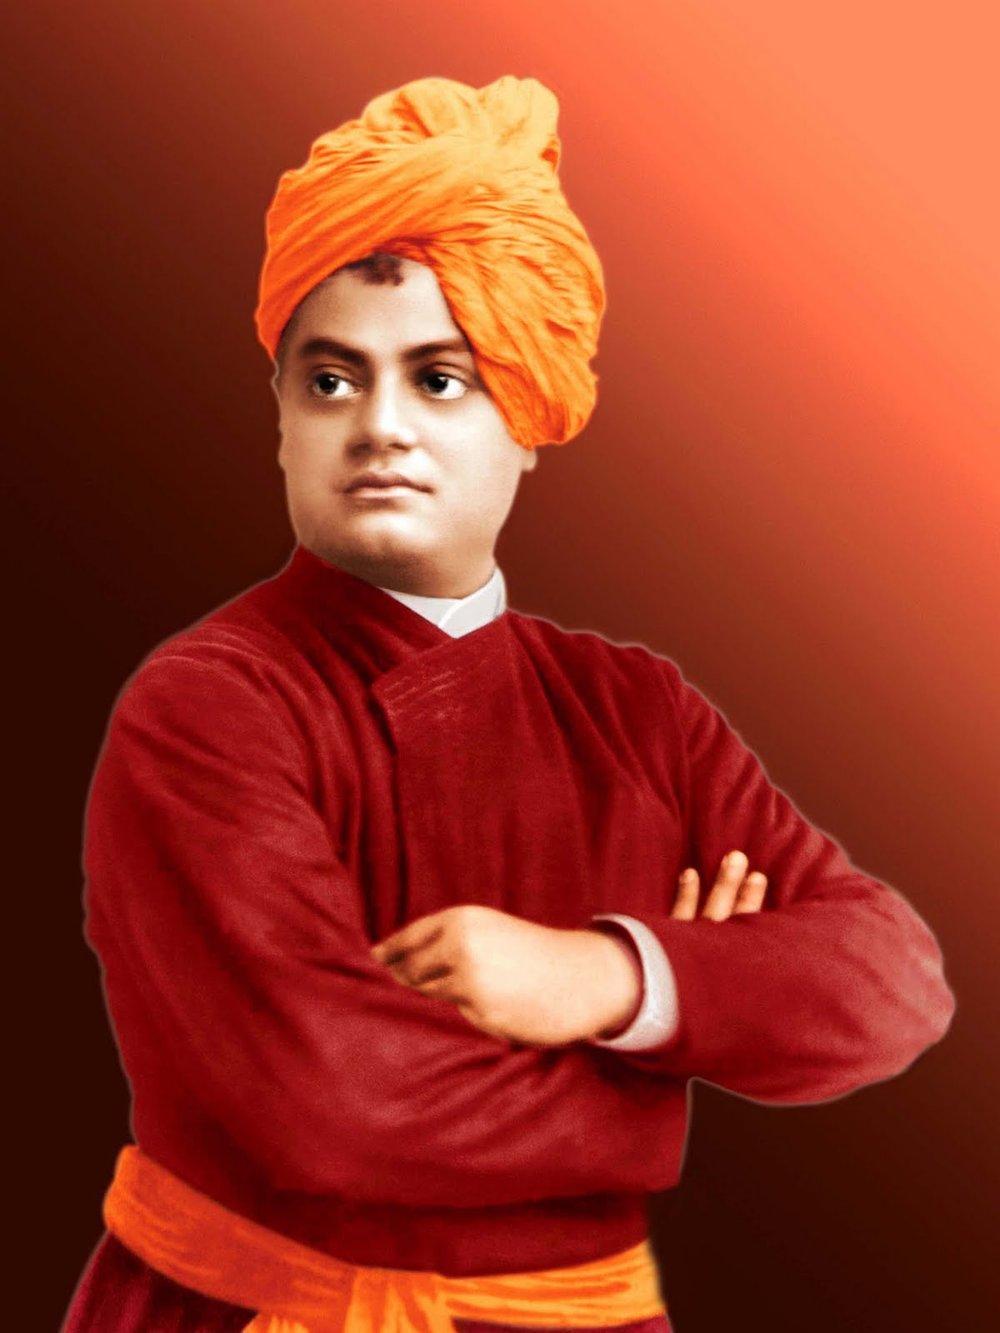 Swami-Vivekananda-Complete-Biography.jpg